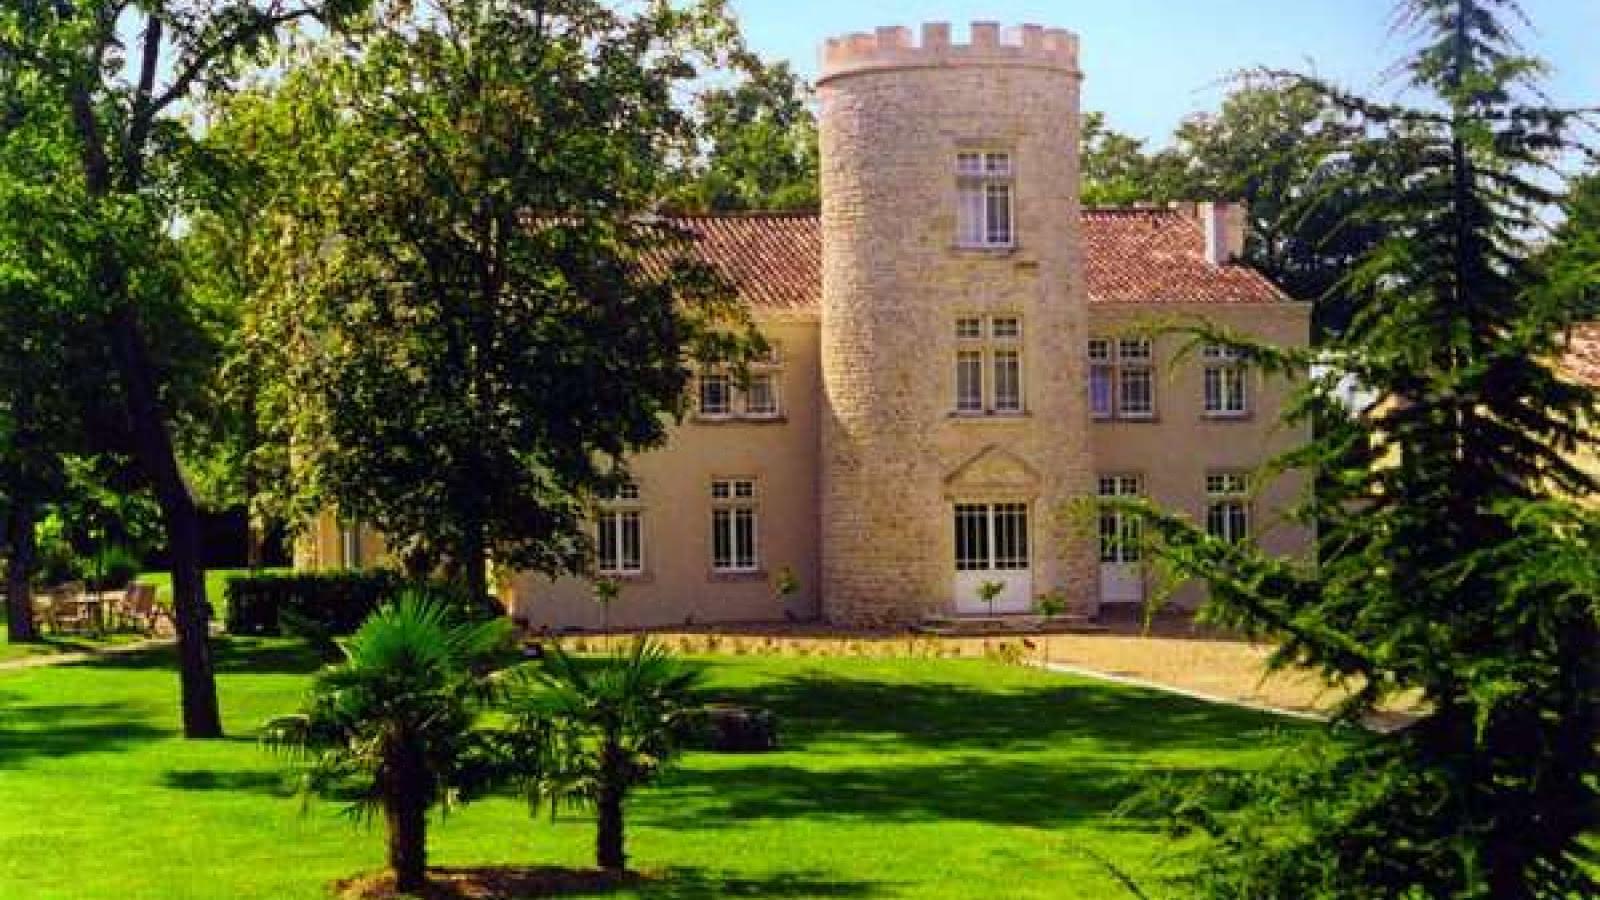 St-Sauveur - Château Fontesteau